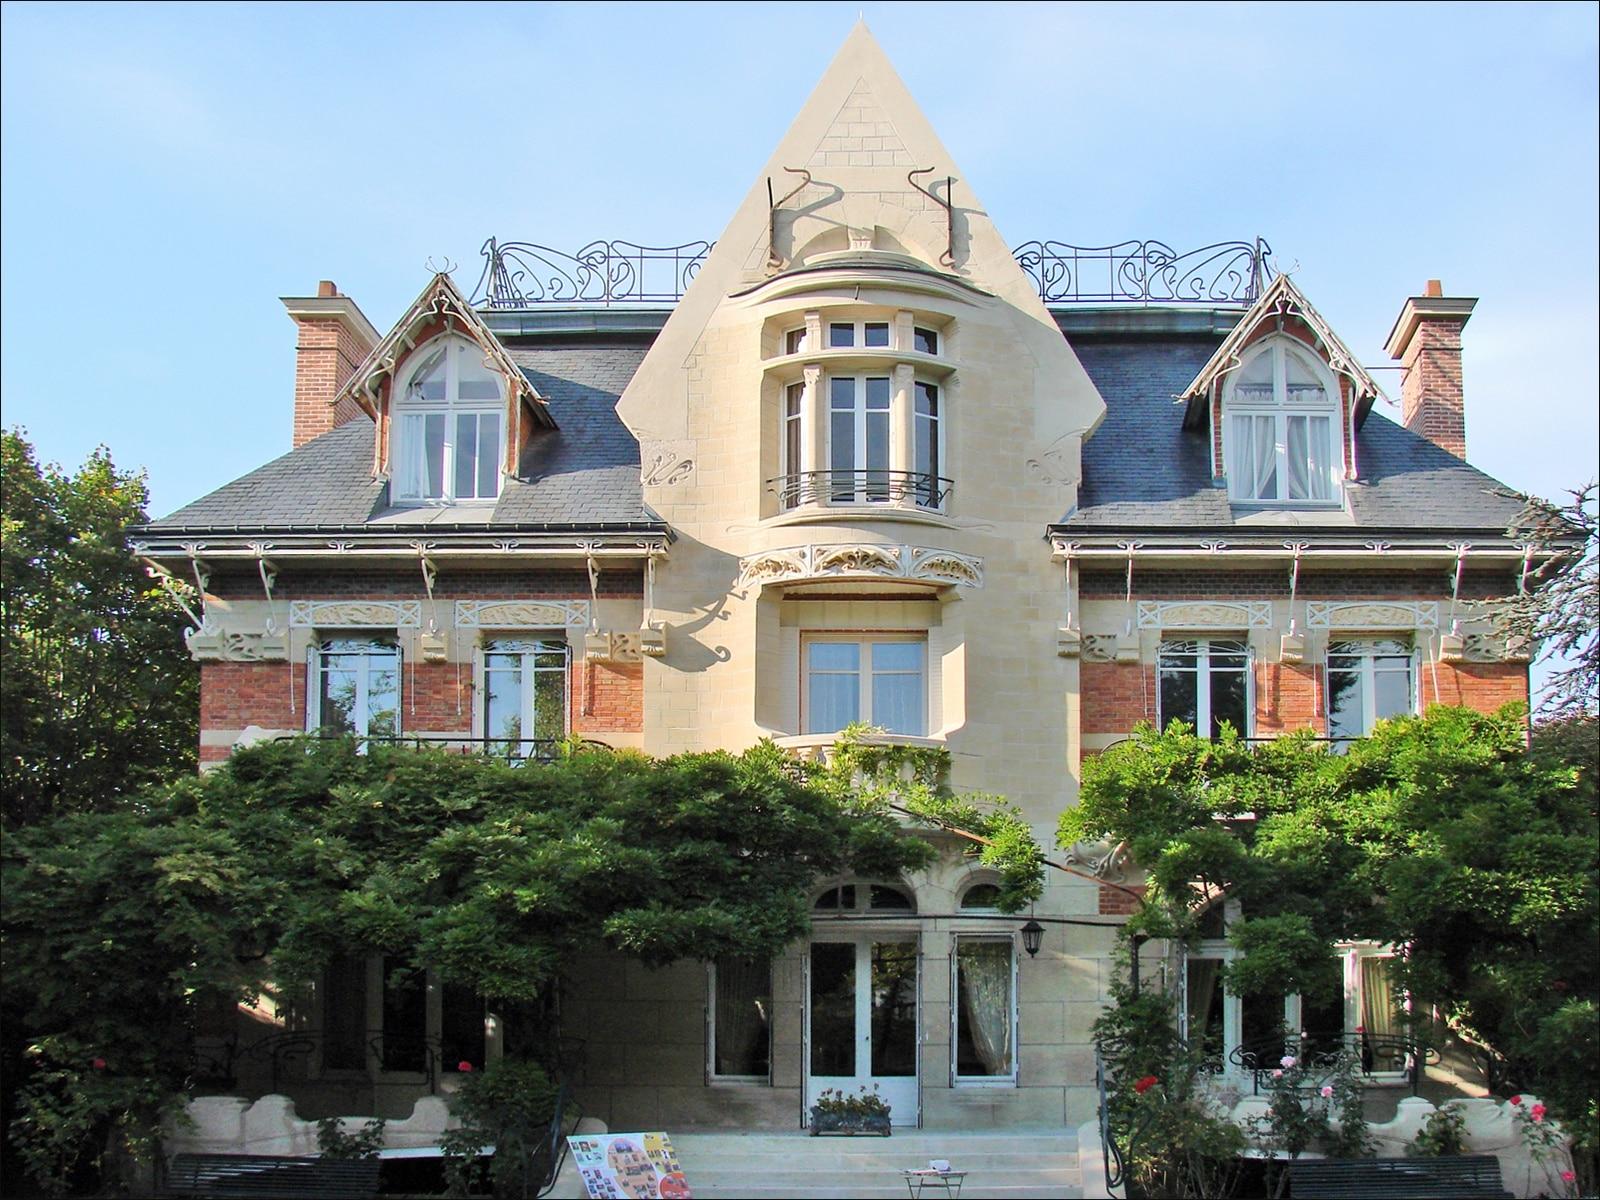 Le Vesinet, Yvelines, France